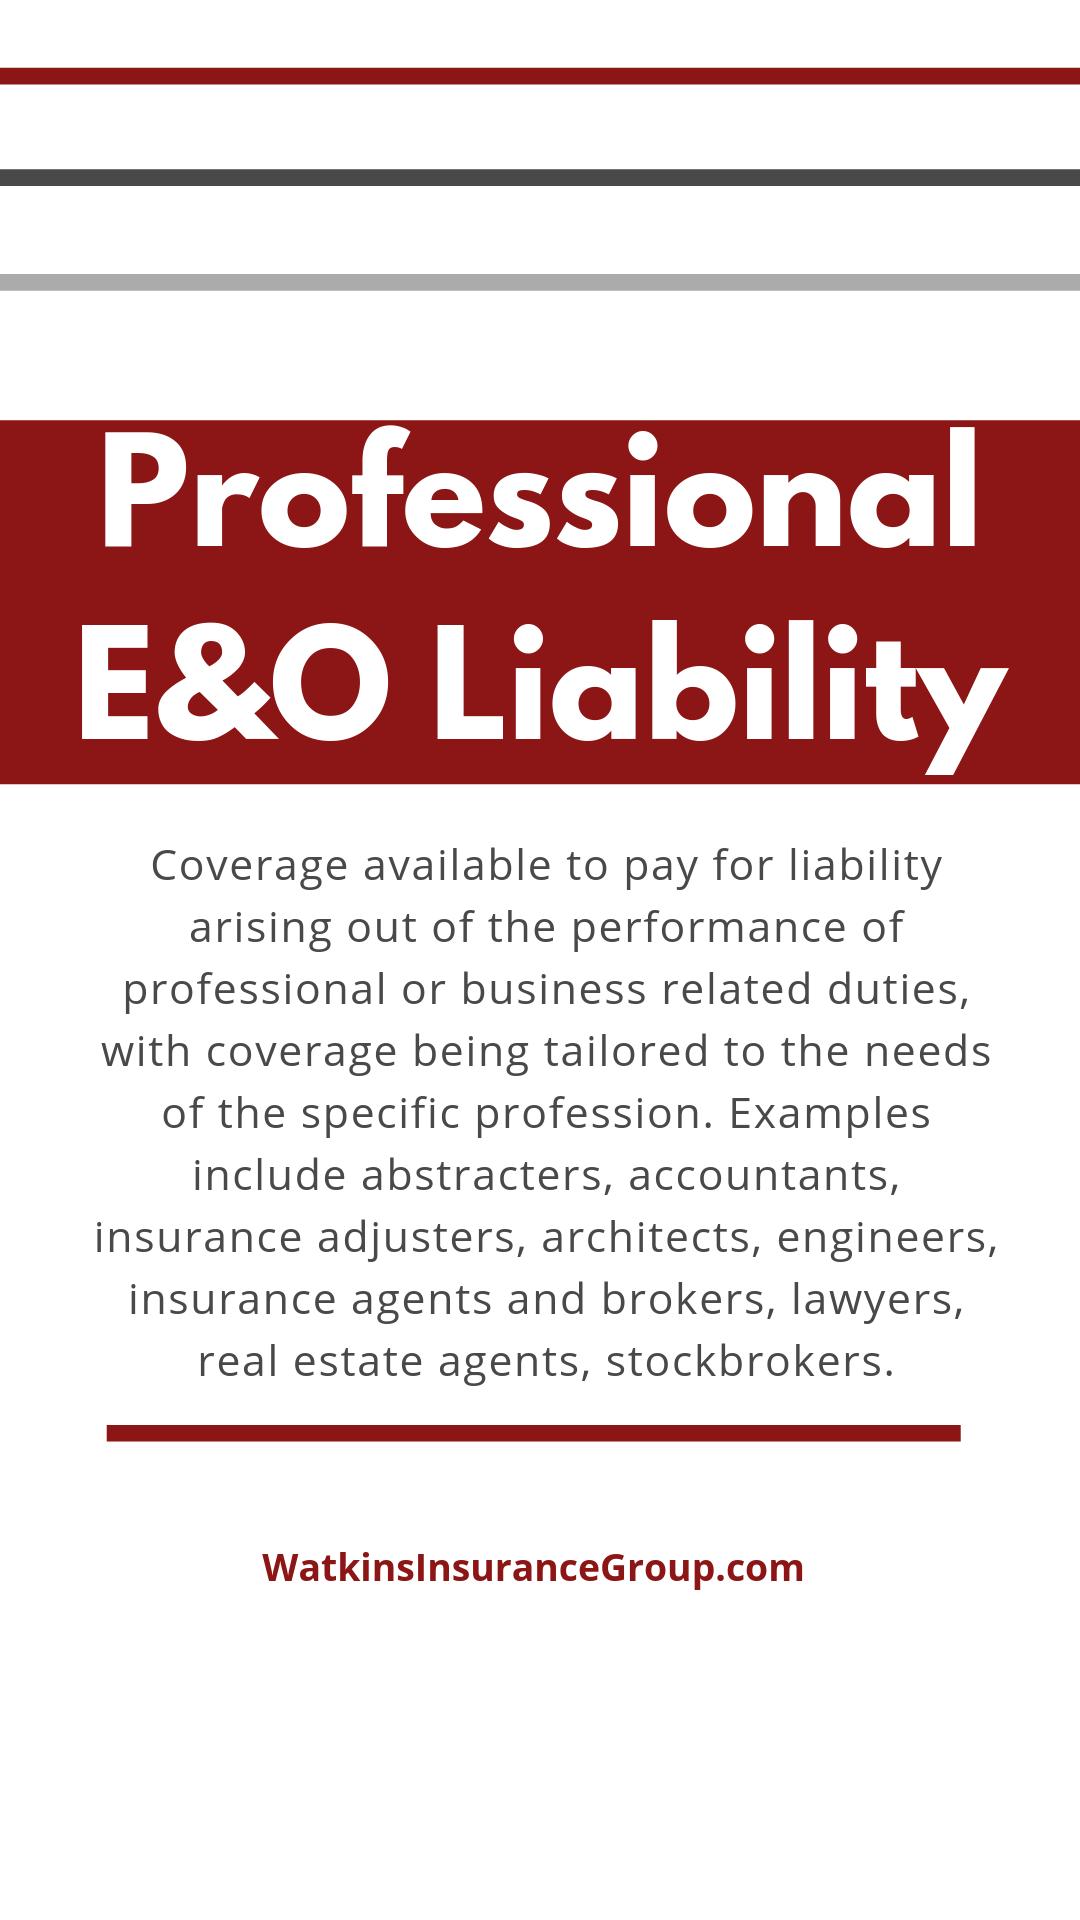 Glossary Business insurance, Stock broker